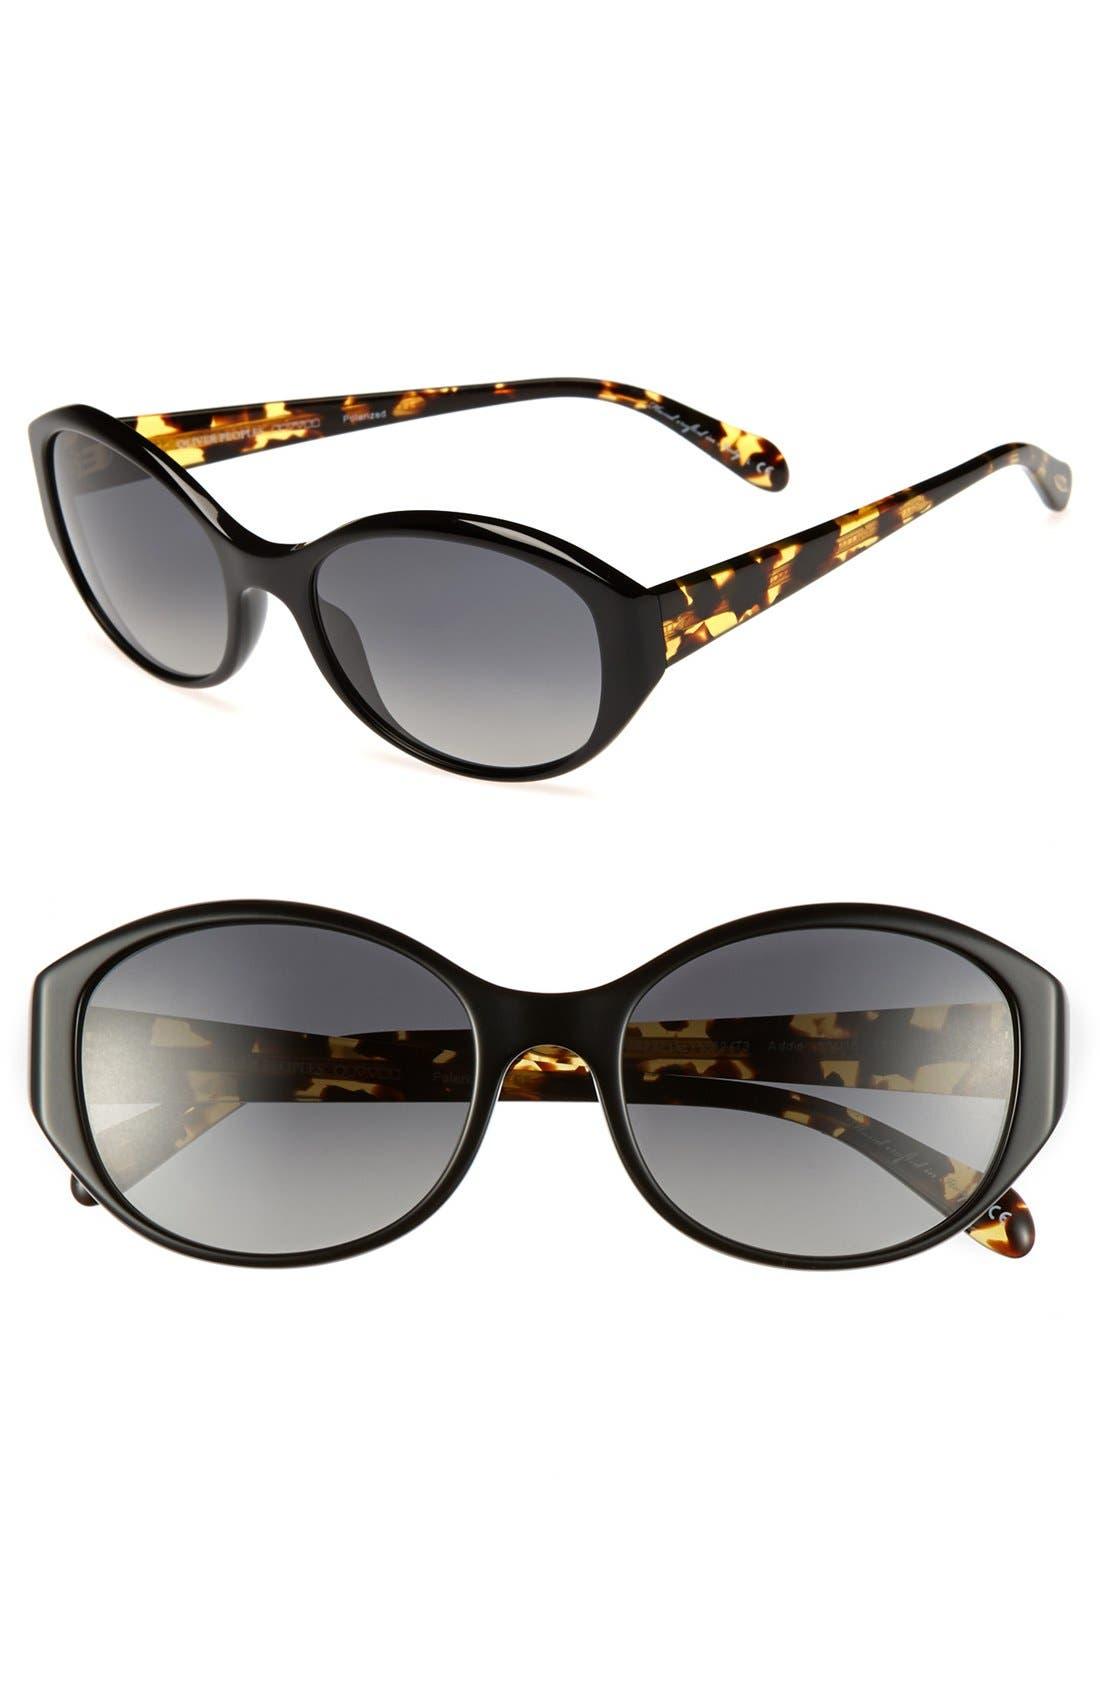 Main Image - Oliver Peoples 'Addie' 55mm Sunglasses